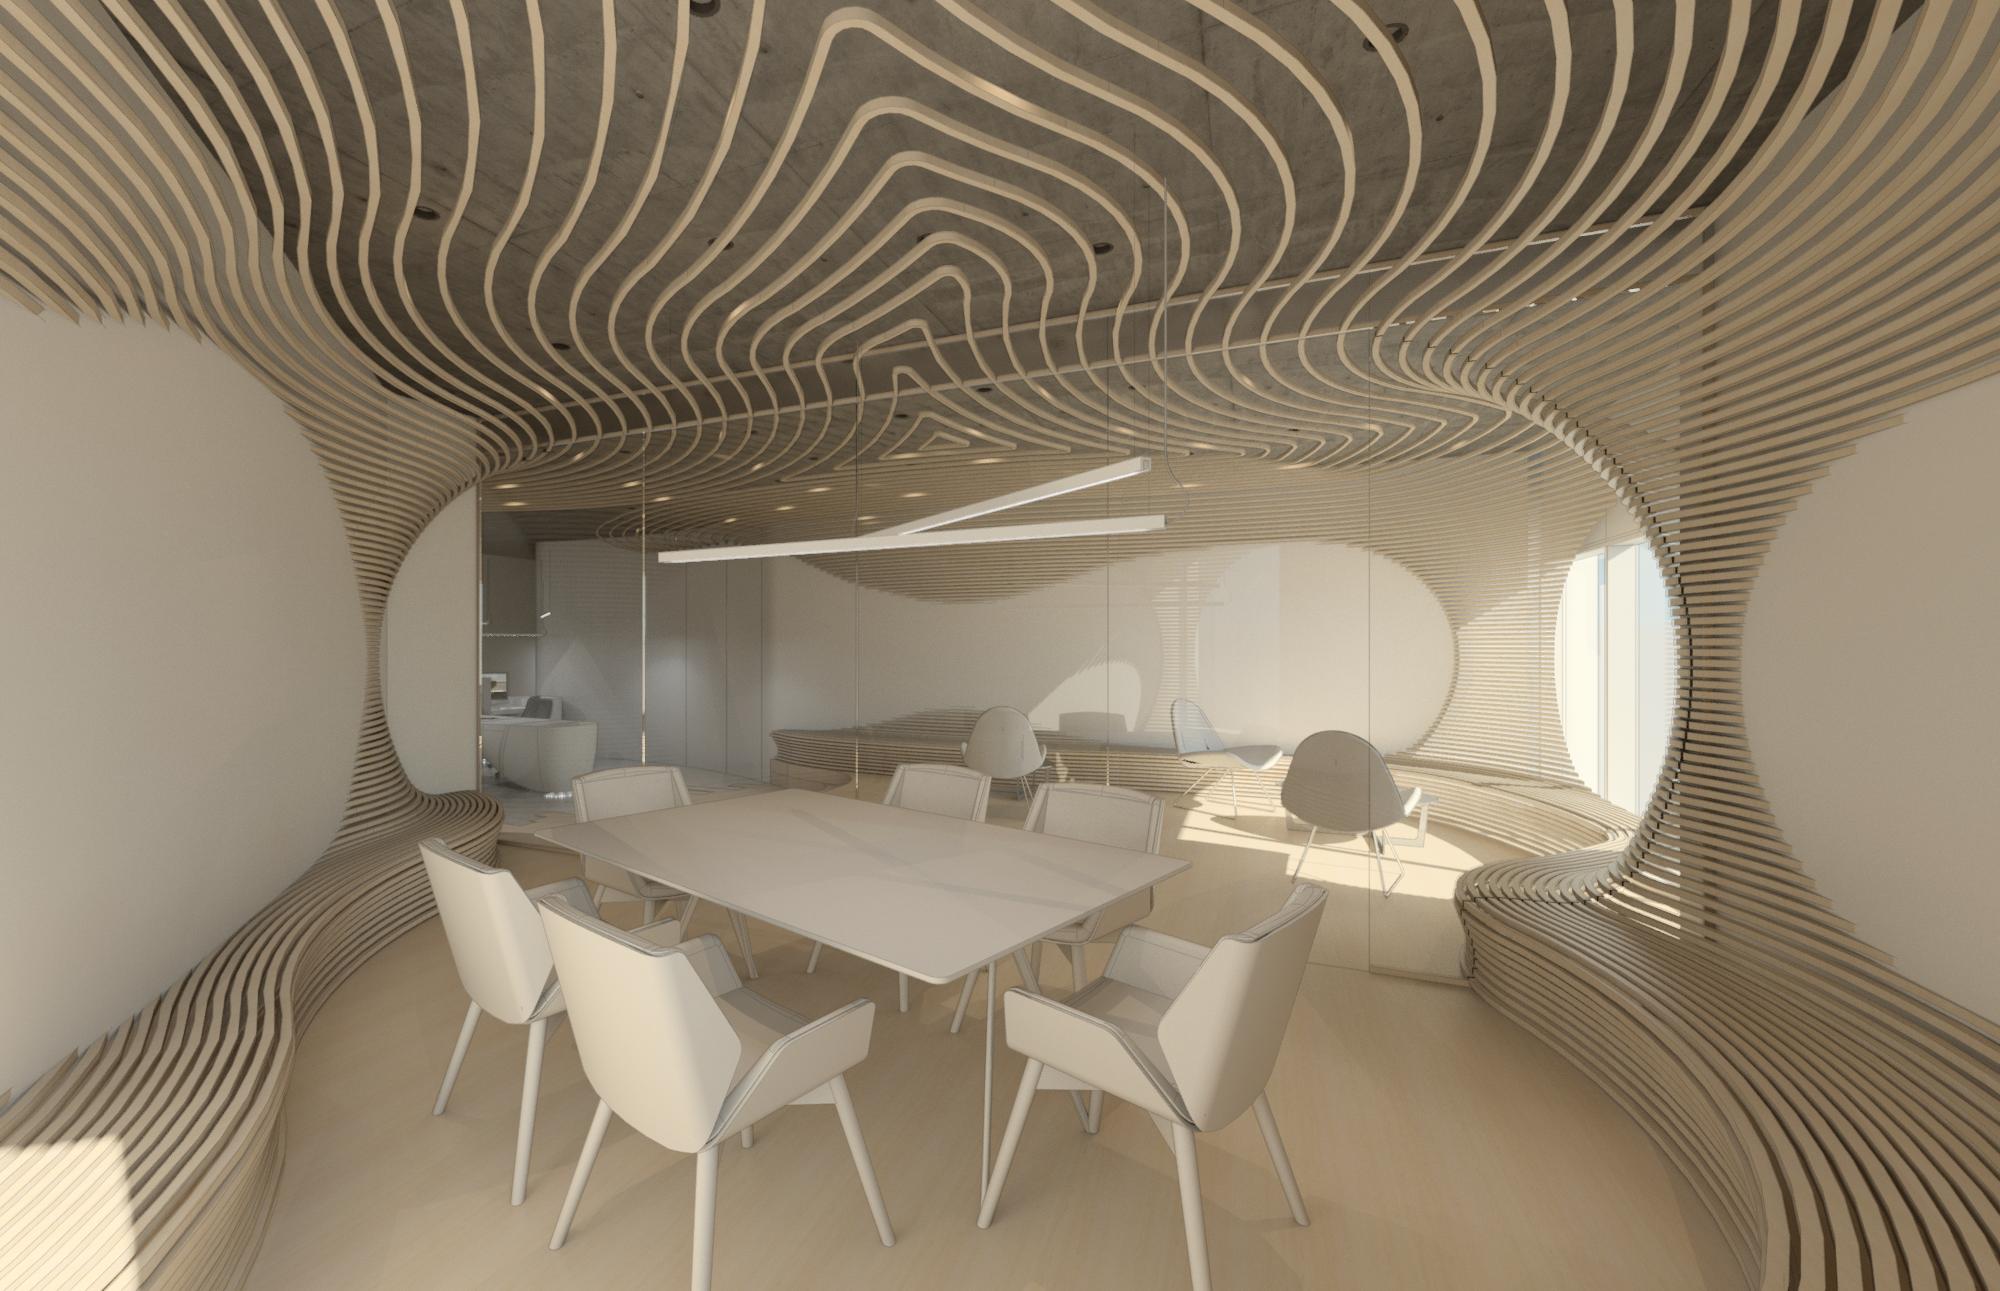 07_Reception Meeting Room_EDIT.png